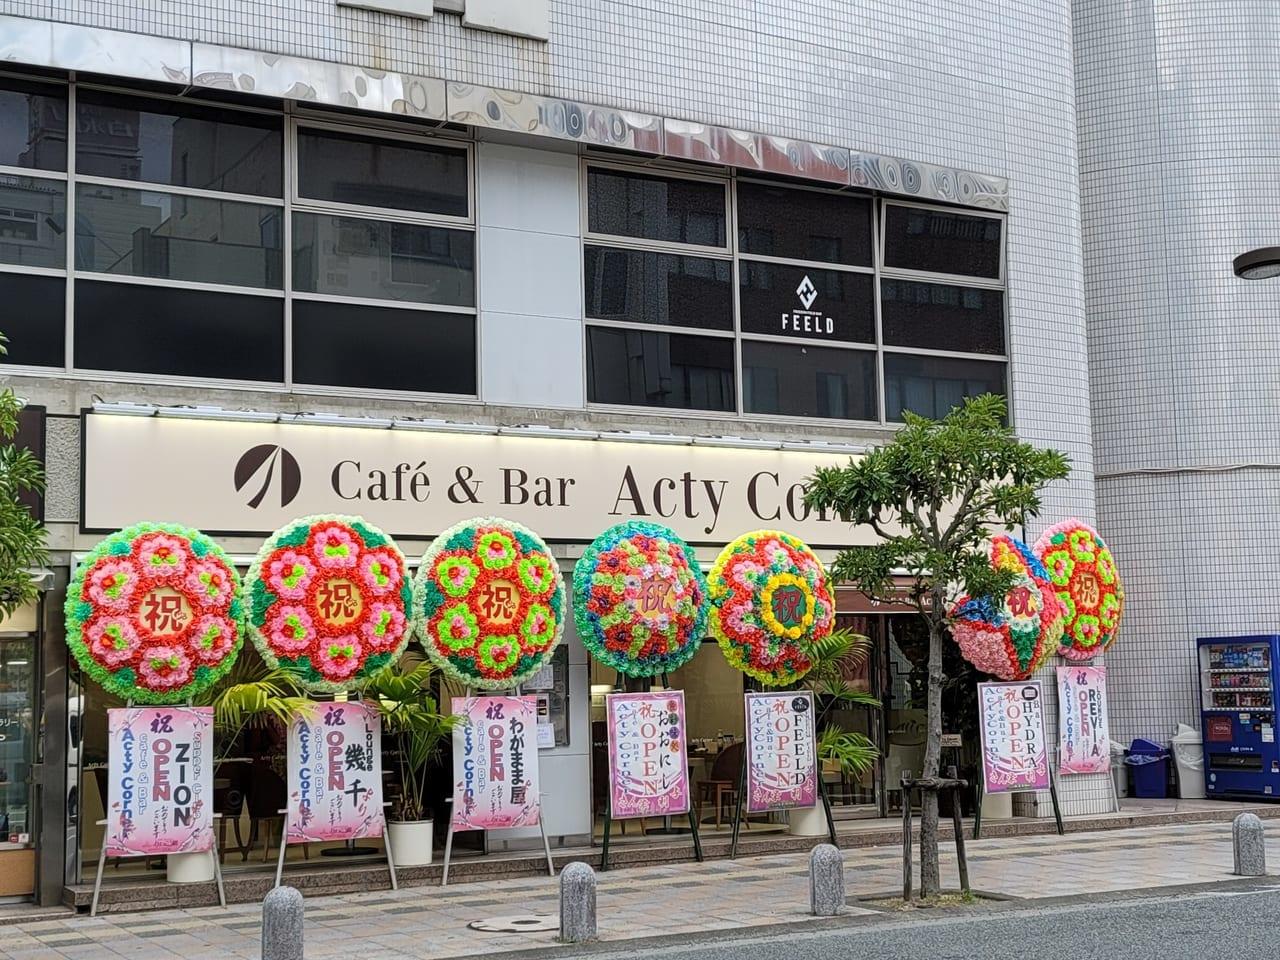 Caf'e&Bar「Acty Corner」の店舗外観